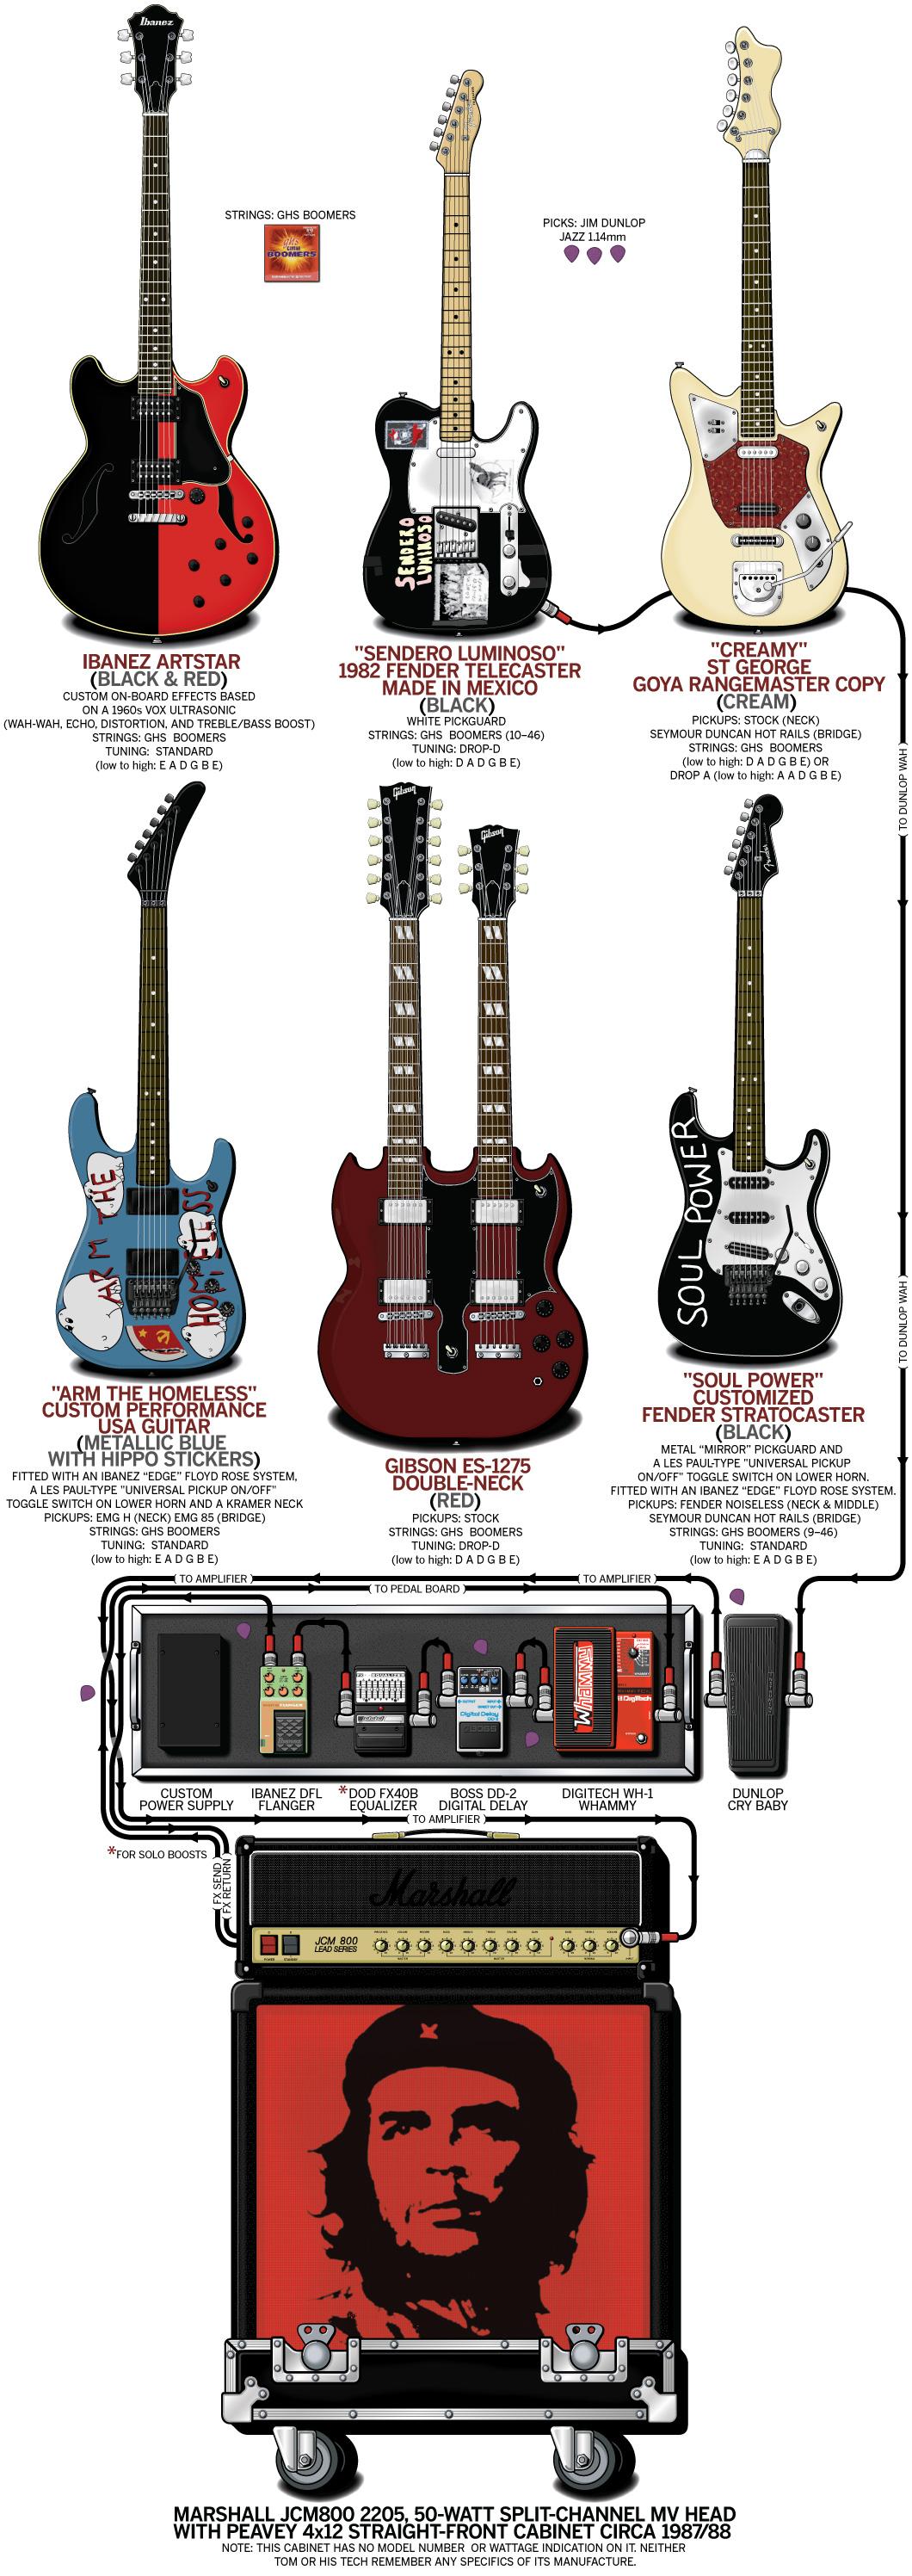 Tom Morello Guitar Gear & Rig – Rage Against The Machine – 1998